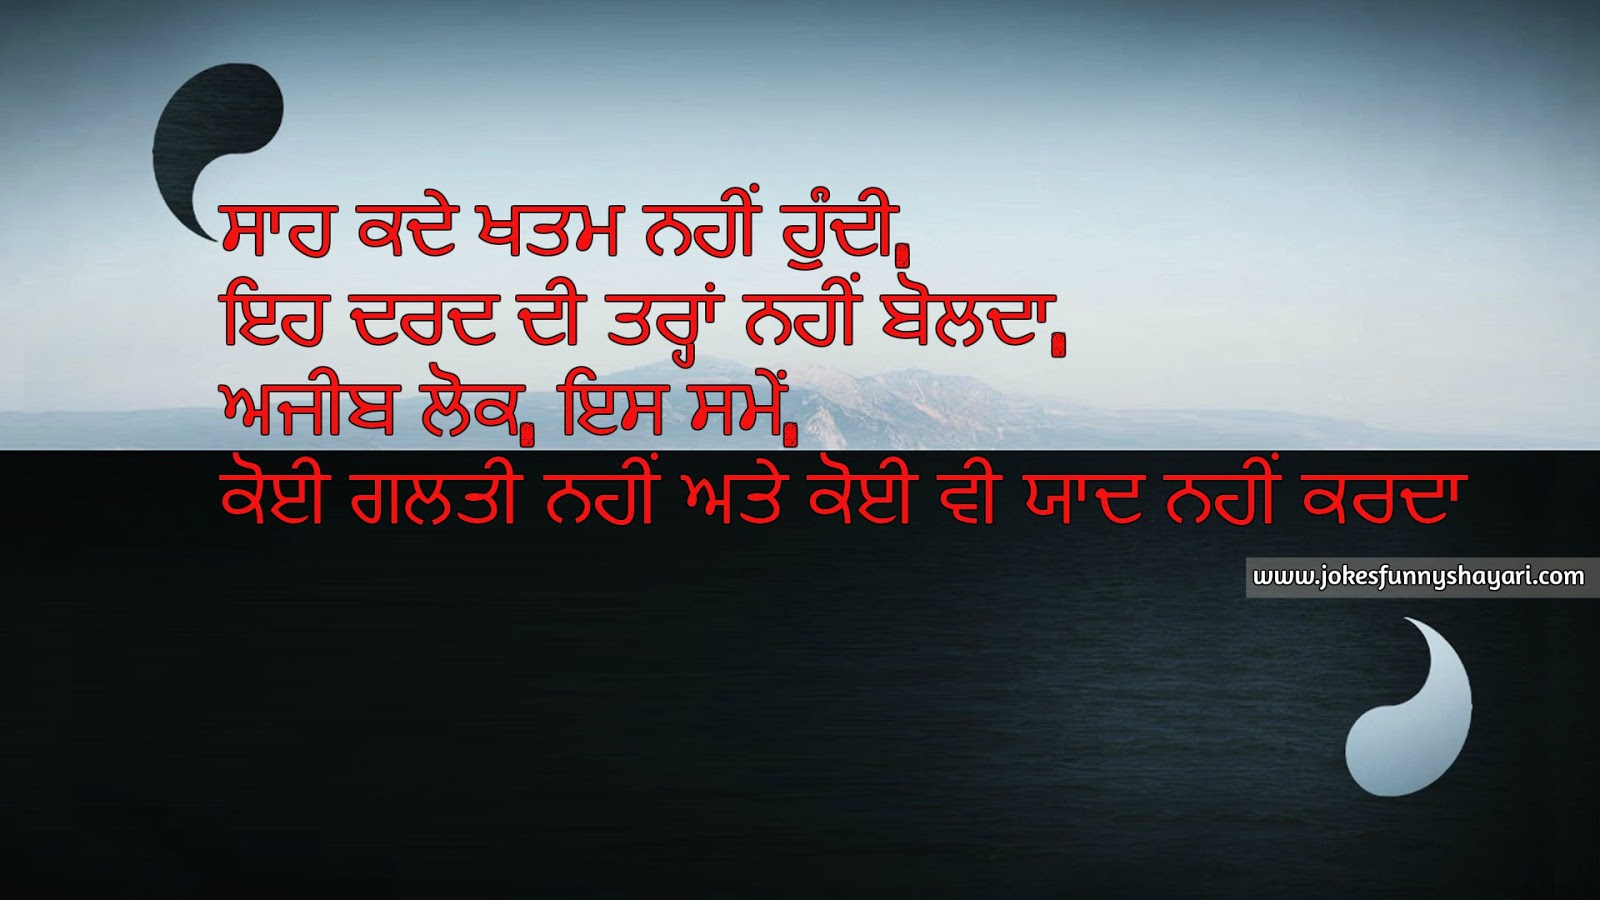 Beautiful Wallpaper Love Punjabi - Love%2Bpunjabi%2Bshayari%2Bimages%2Bdownloadd%2B%25281%2529  Perfect Image Reference_4097100.jpg